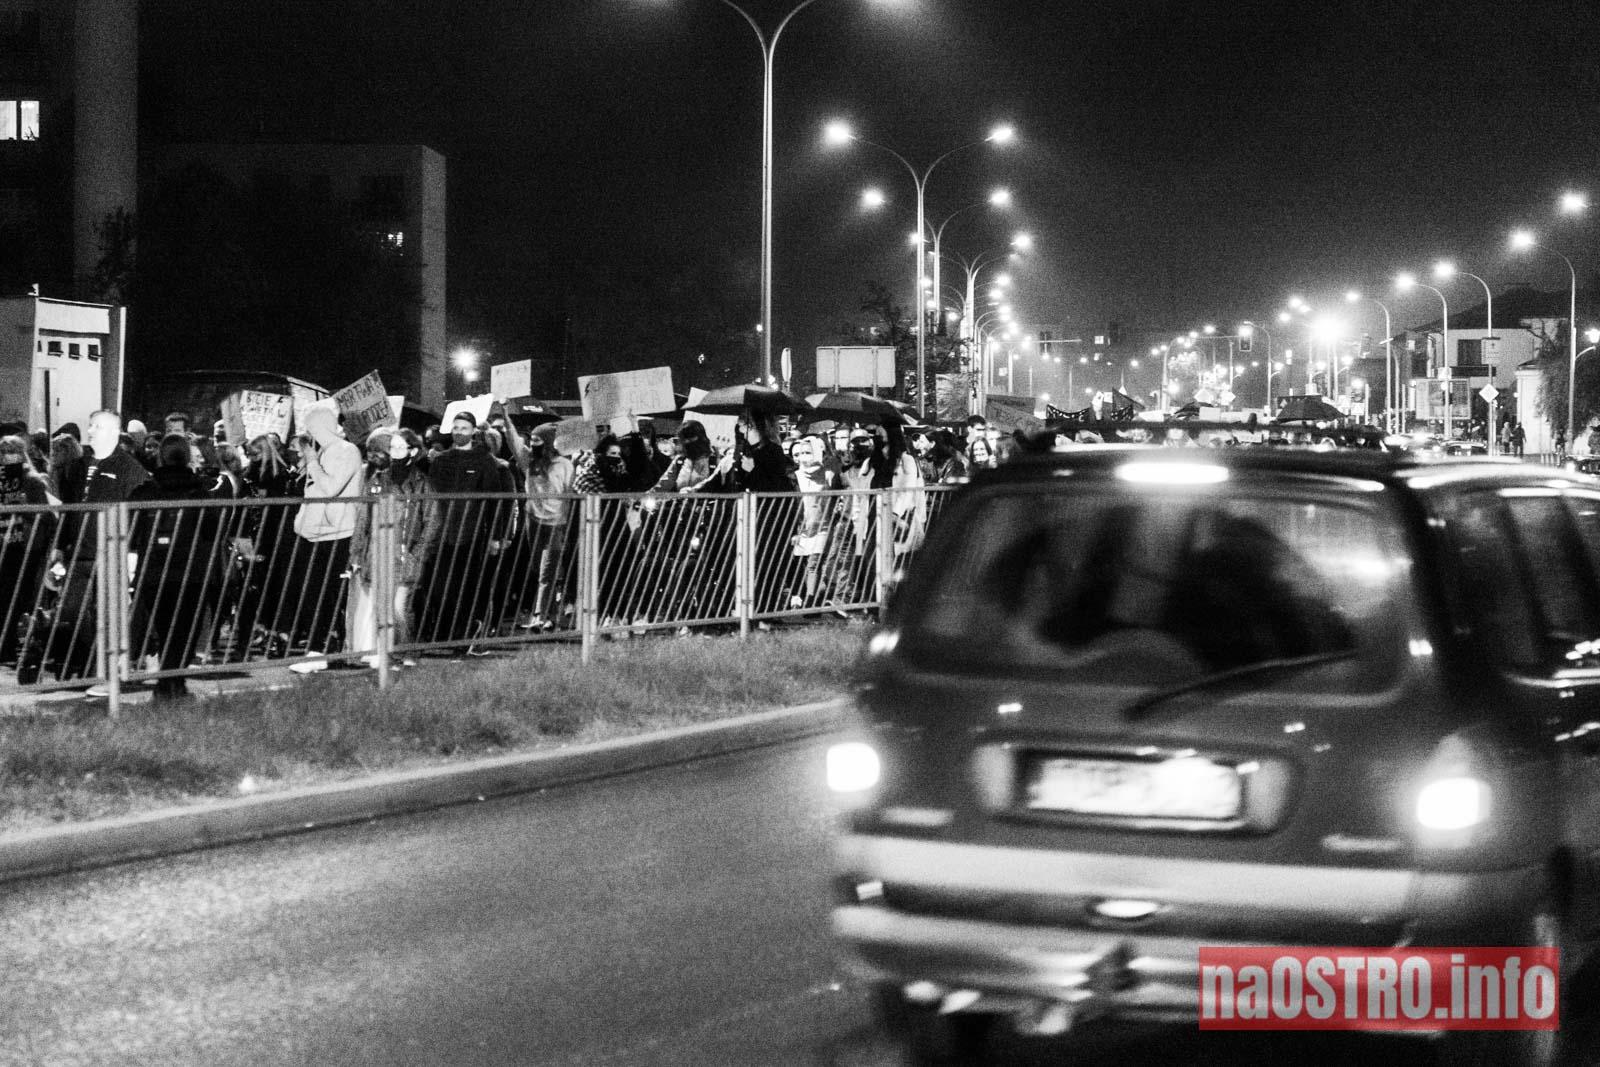 NaOSTROinfo Protest kobiet-52